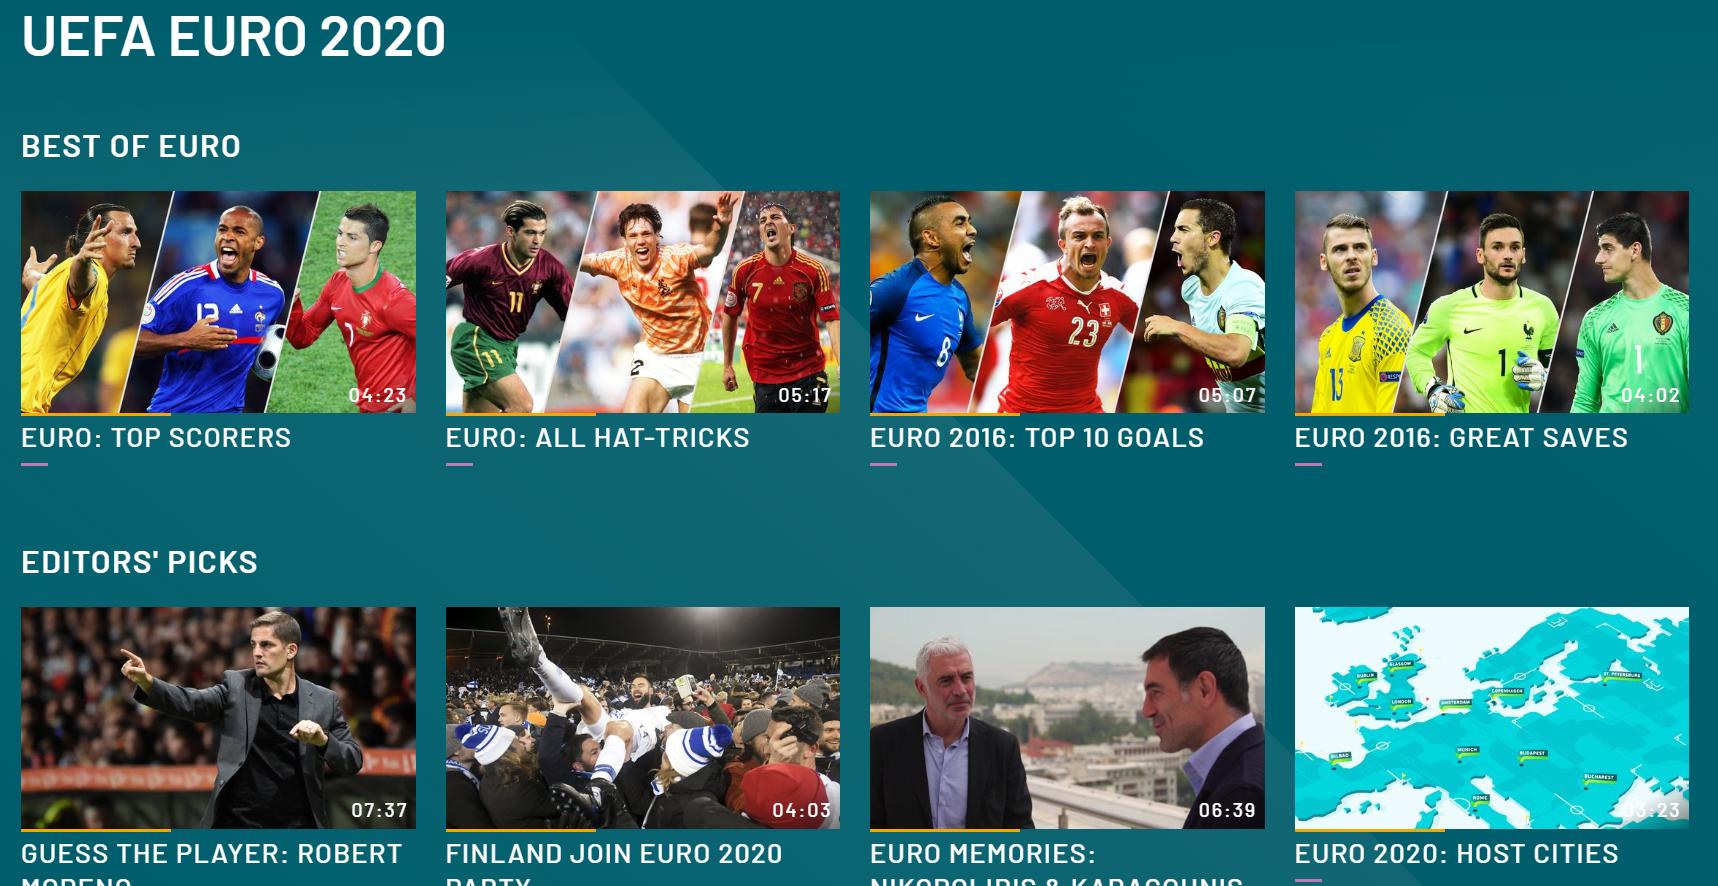 uefatv-euro